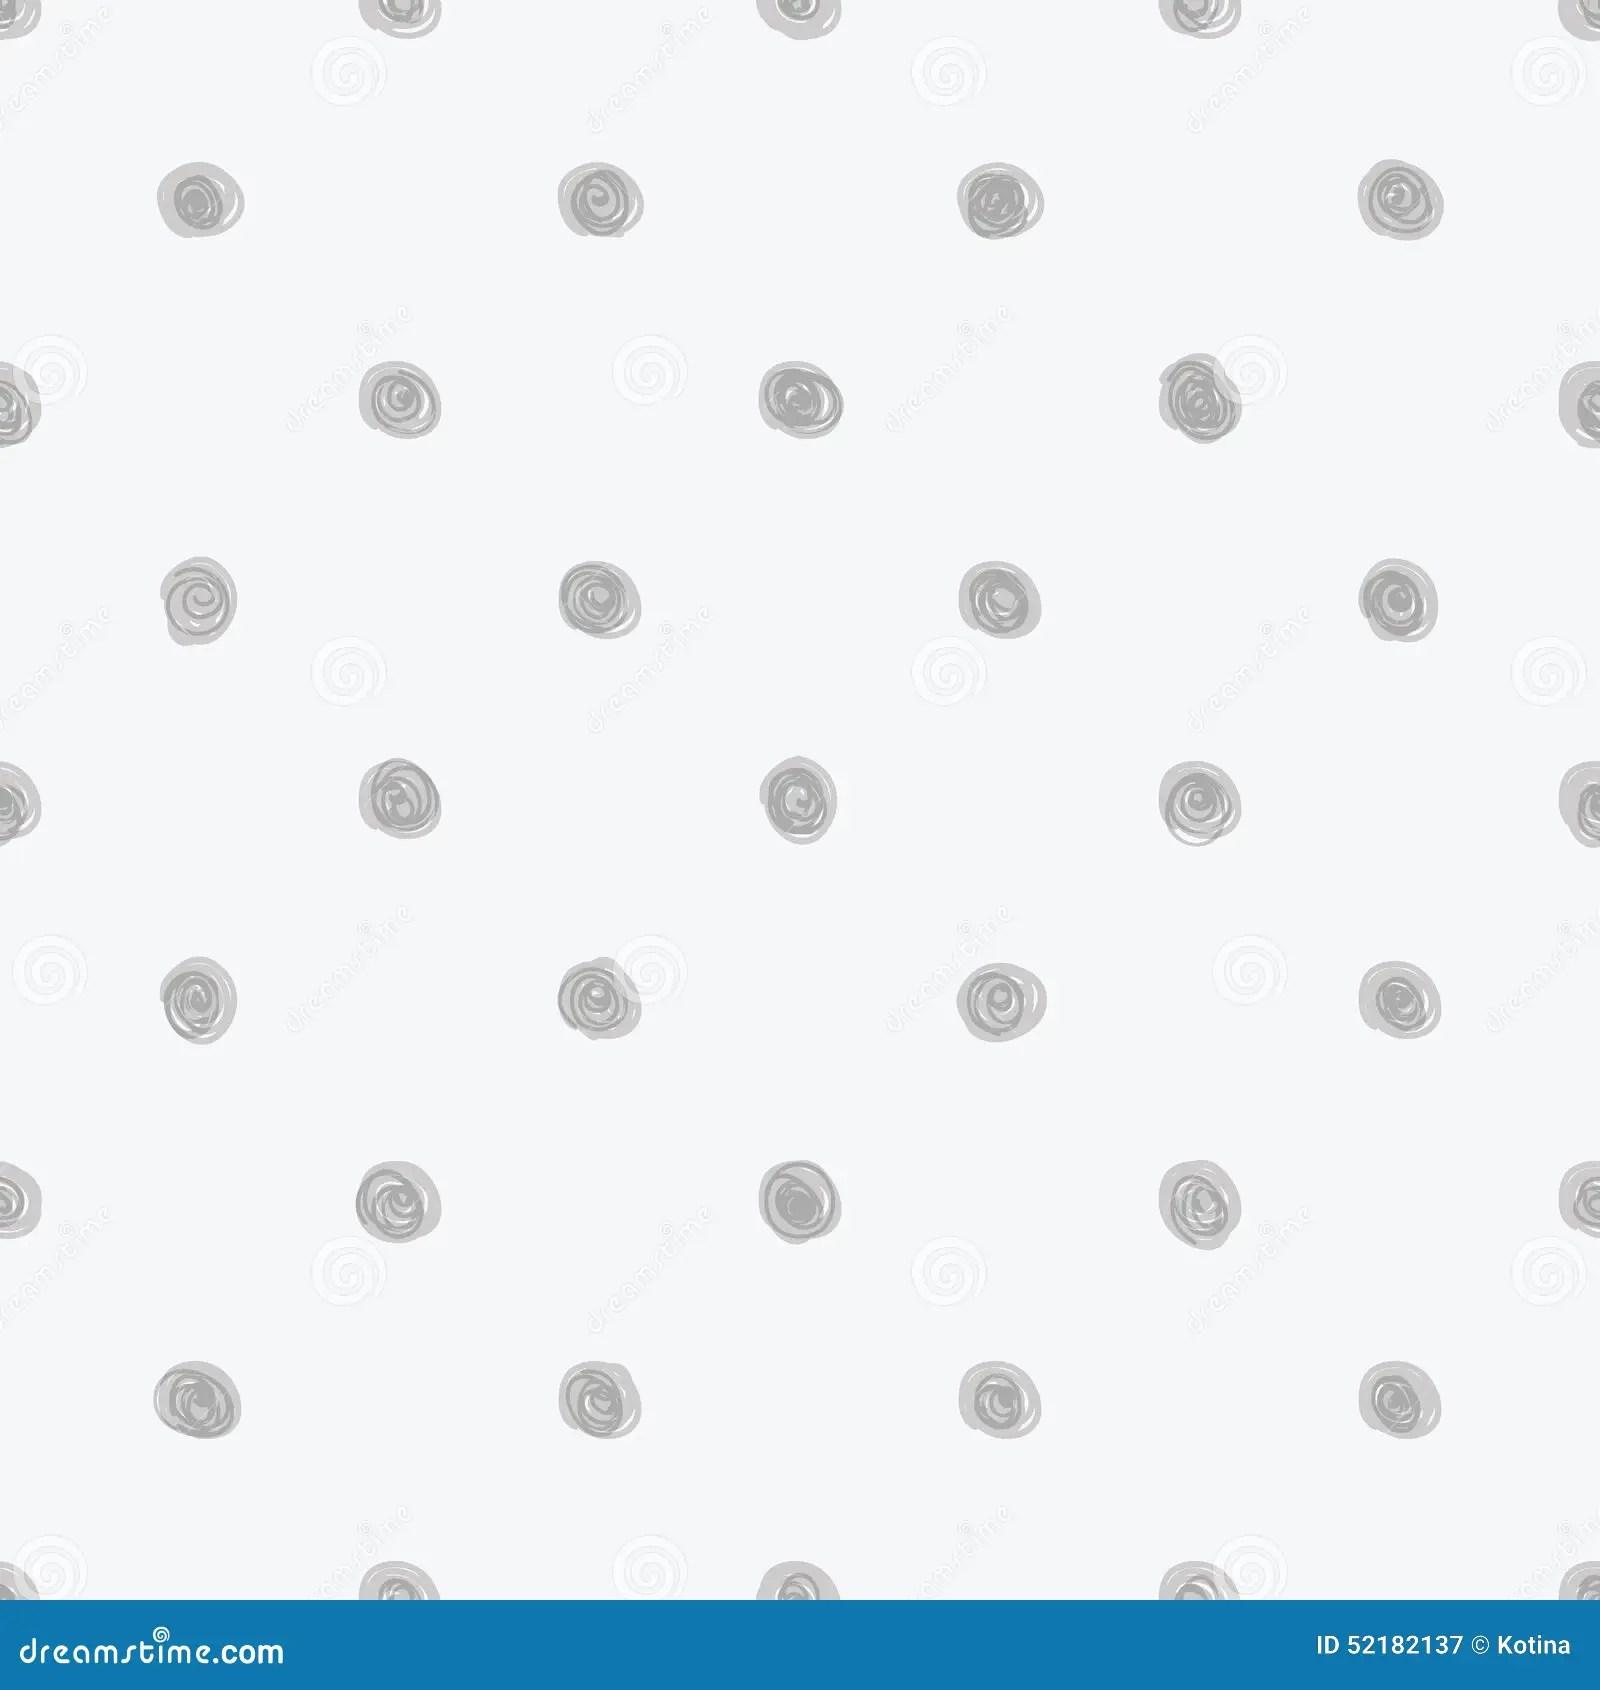 Hand Drawn Doodle Polka Dot Texture Seamless Soft Grey